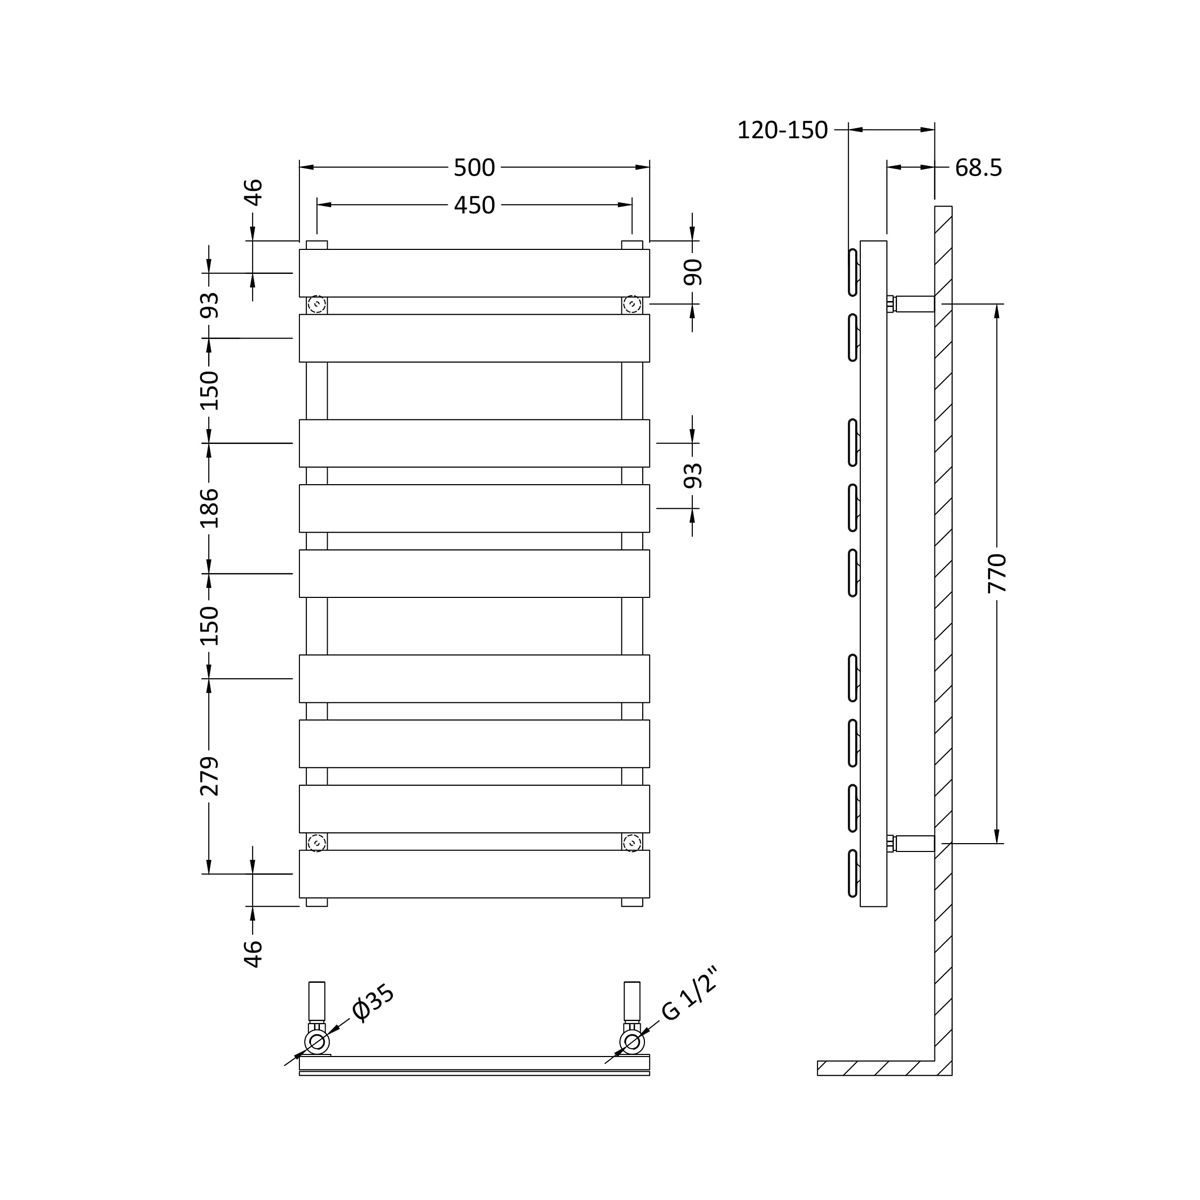 Hudson Reed Flat Piazza Chrome Dual Fuel 9 Bar Designer Radiator 950 x 500mm Dimensions